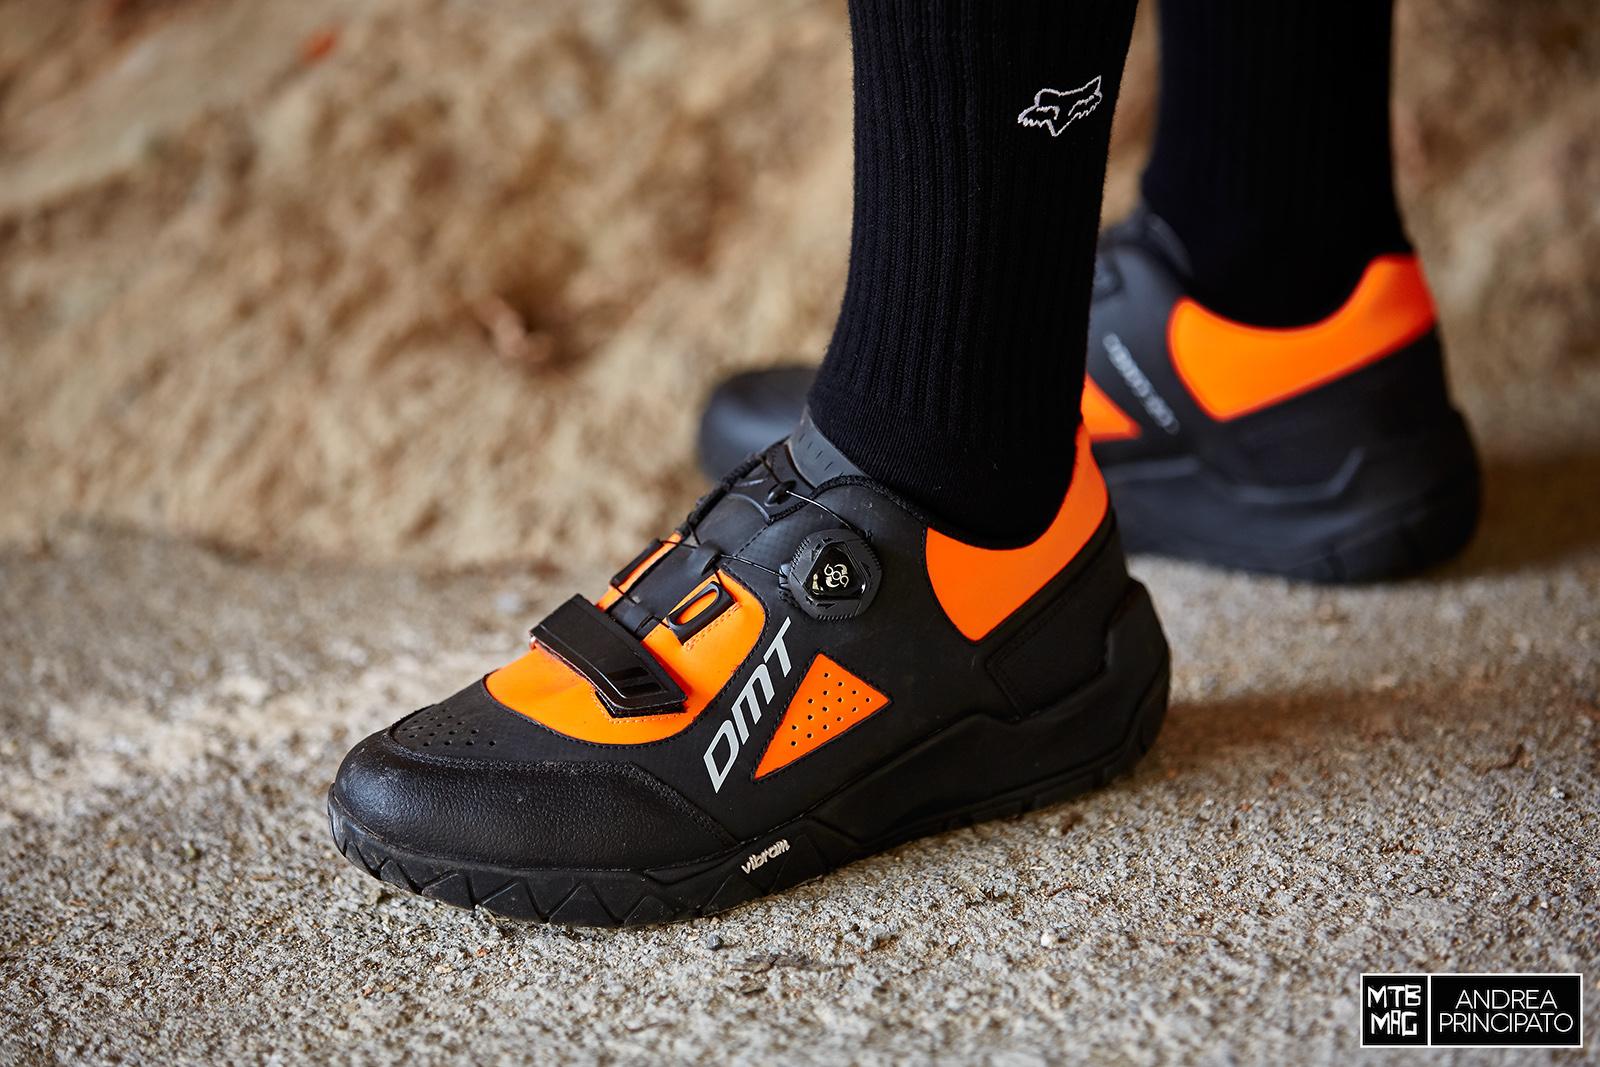 low priced 0d604 c8eb8 MTB-MAG.COM - Mountain Bike Online Magazine | [Test] Scarpe ...